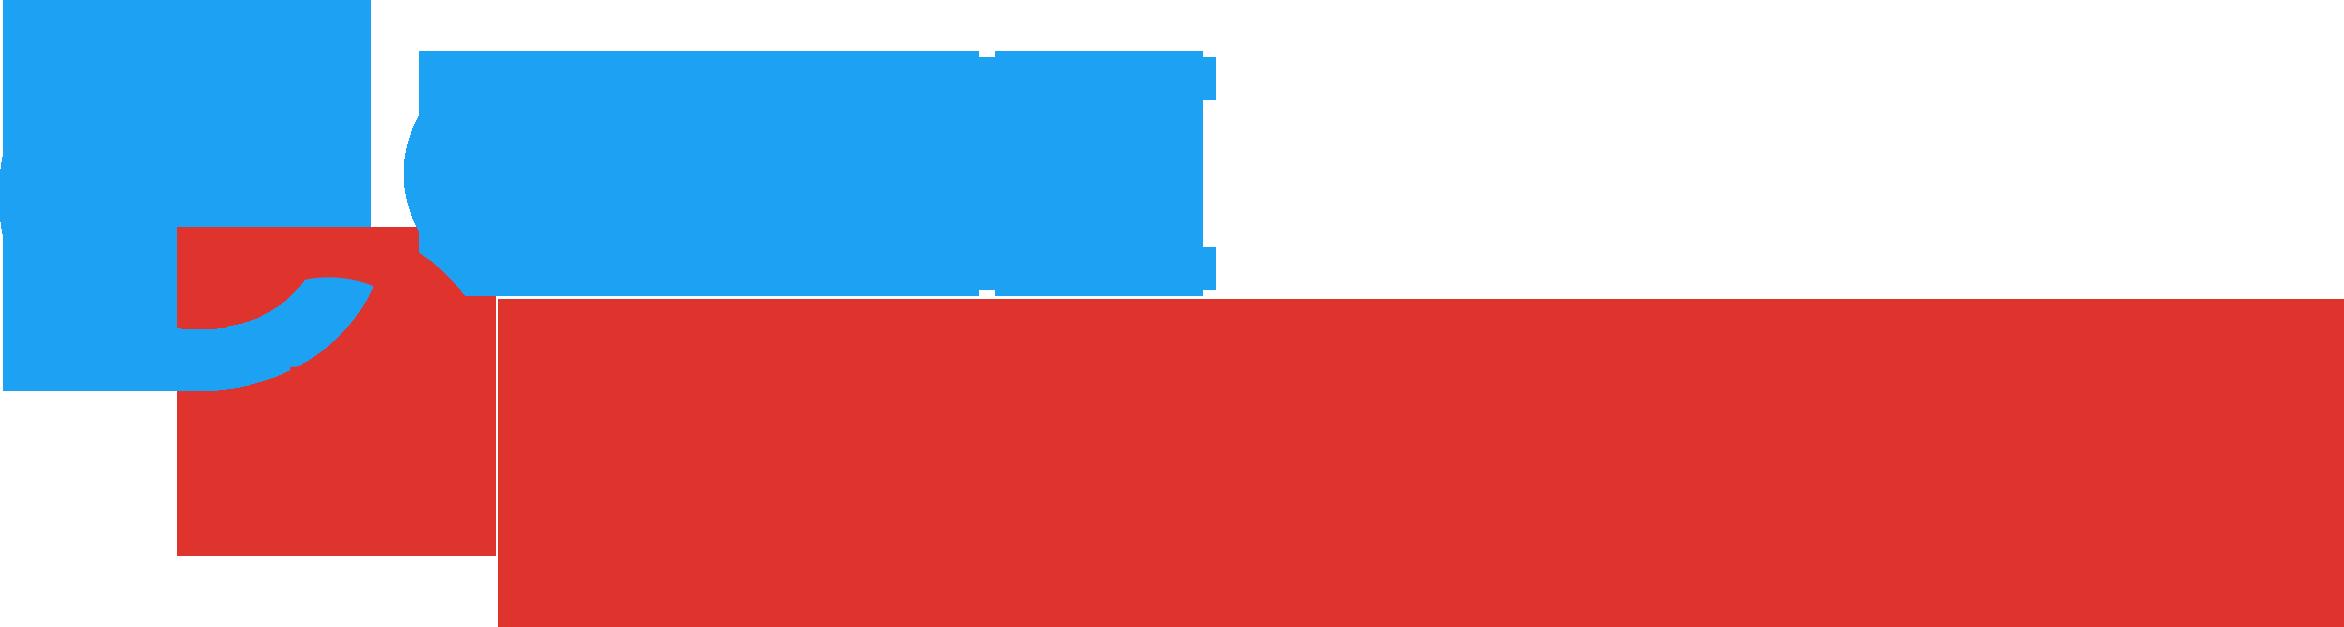 Realty.Sochi-Express.ru - Портал недвижимости